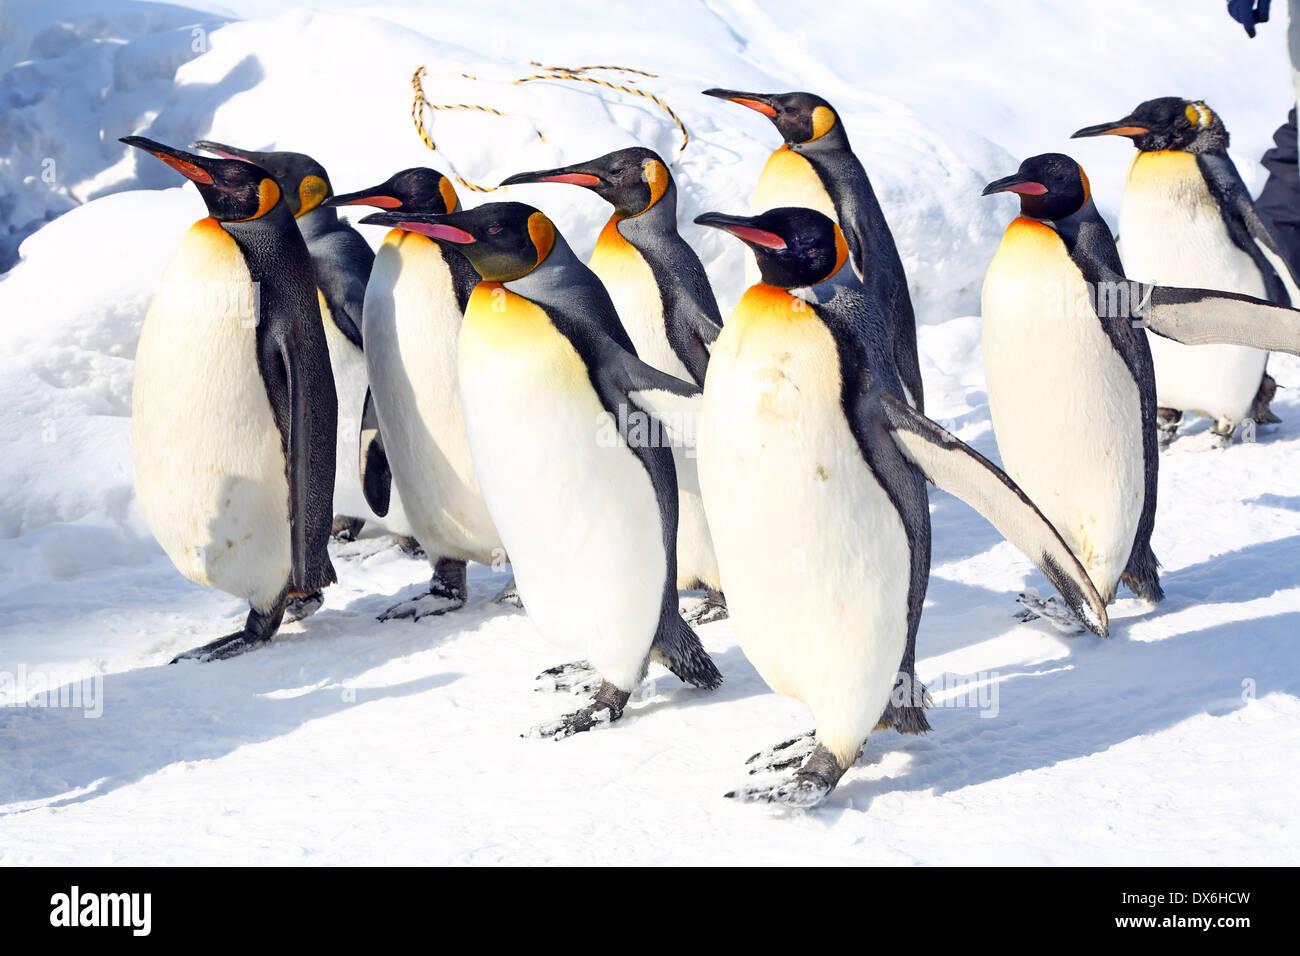 Paseo de pingüinos en el zoo de Asahiyama en Asahikawa, Japón Imagen De Stock